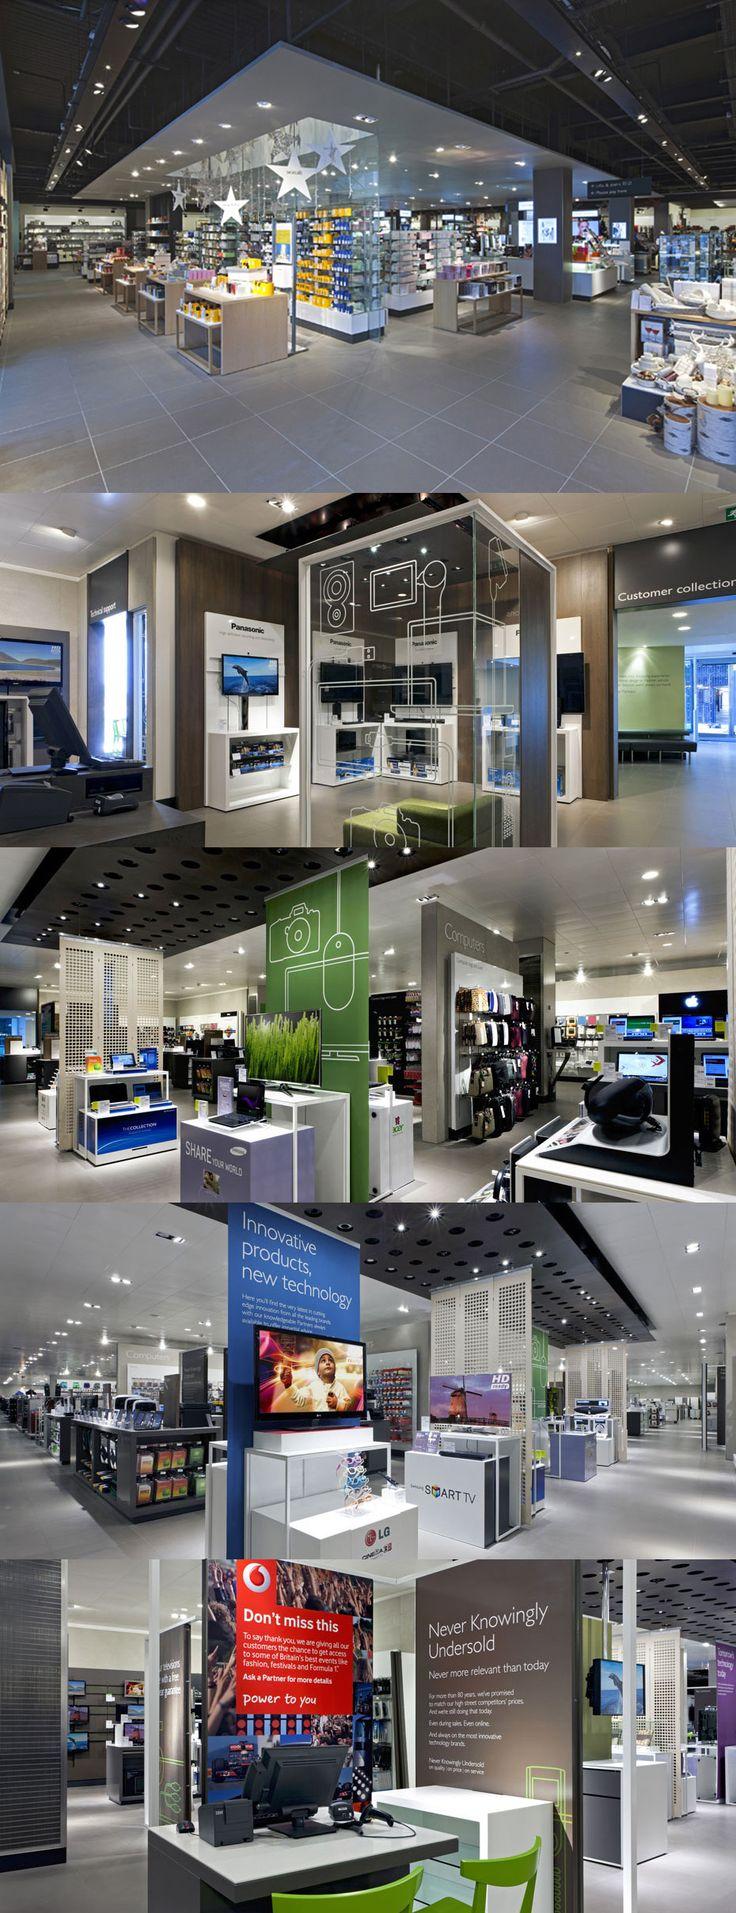 John Lewis appliances store